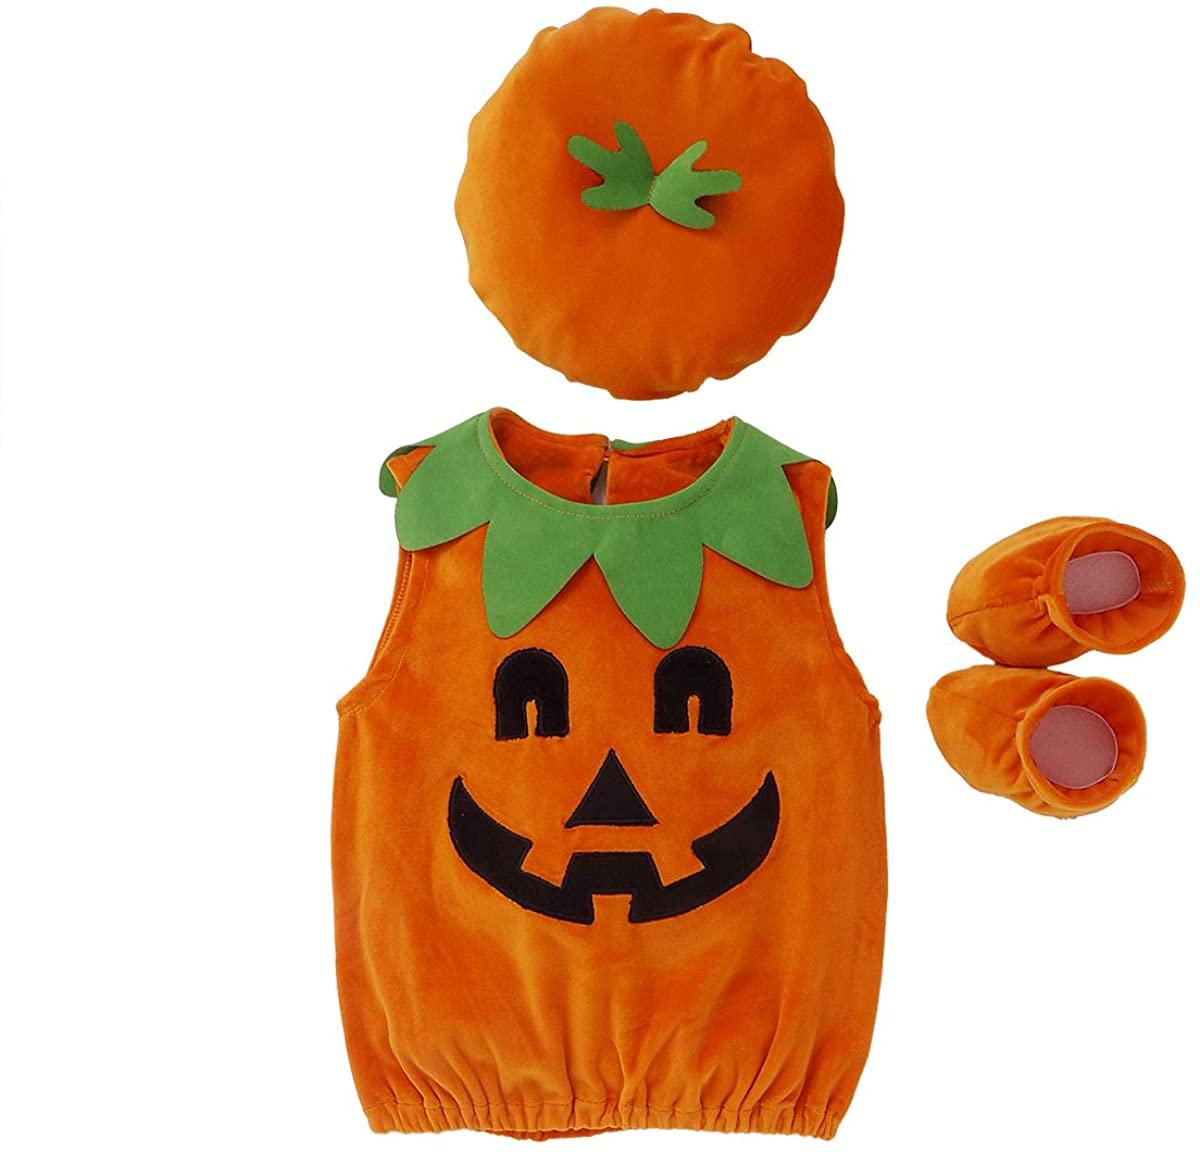 Infant Toddler Baby Halloween Costumes Cute Pumpkin Vest+Shoes+Hat 3Pcs Outfit Clothes Set